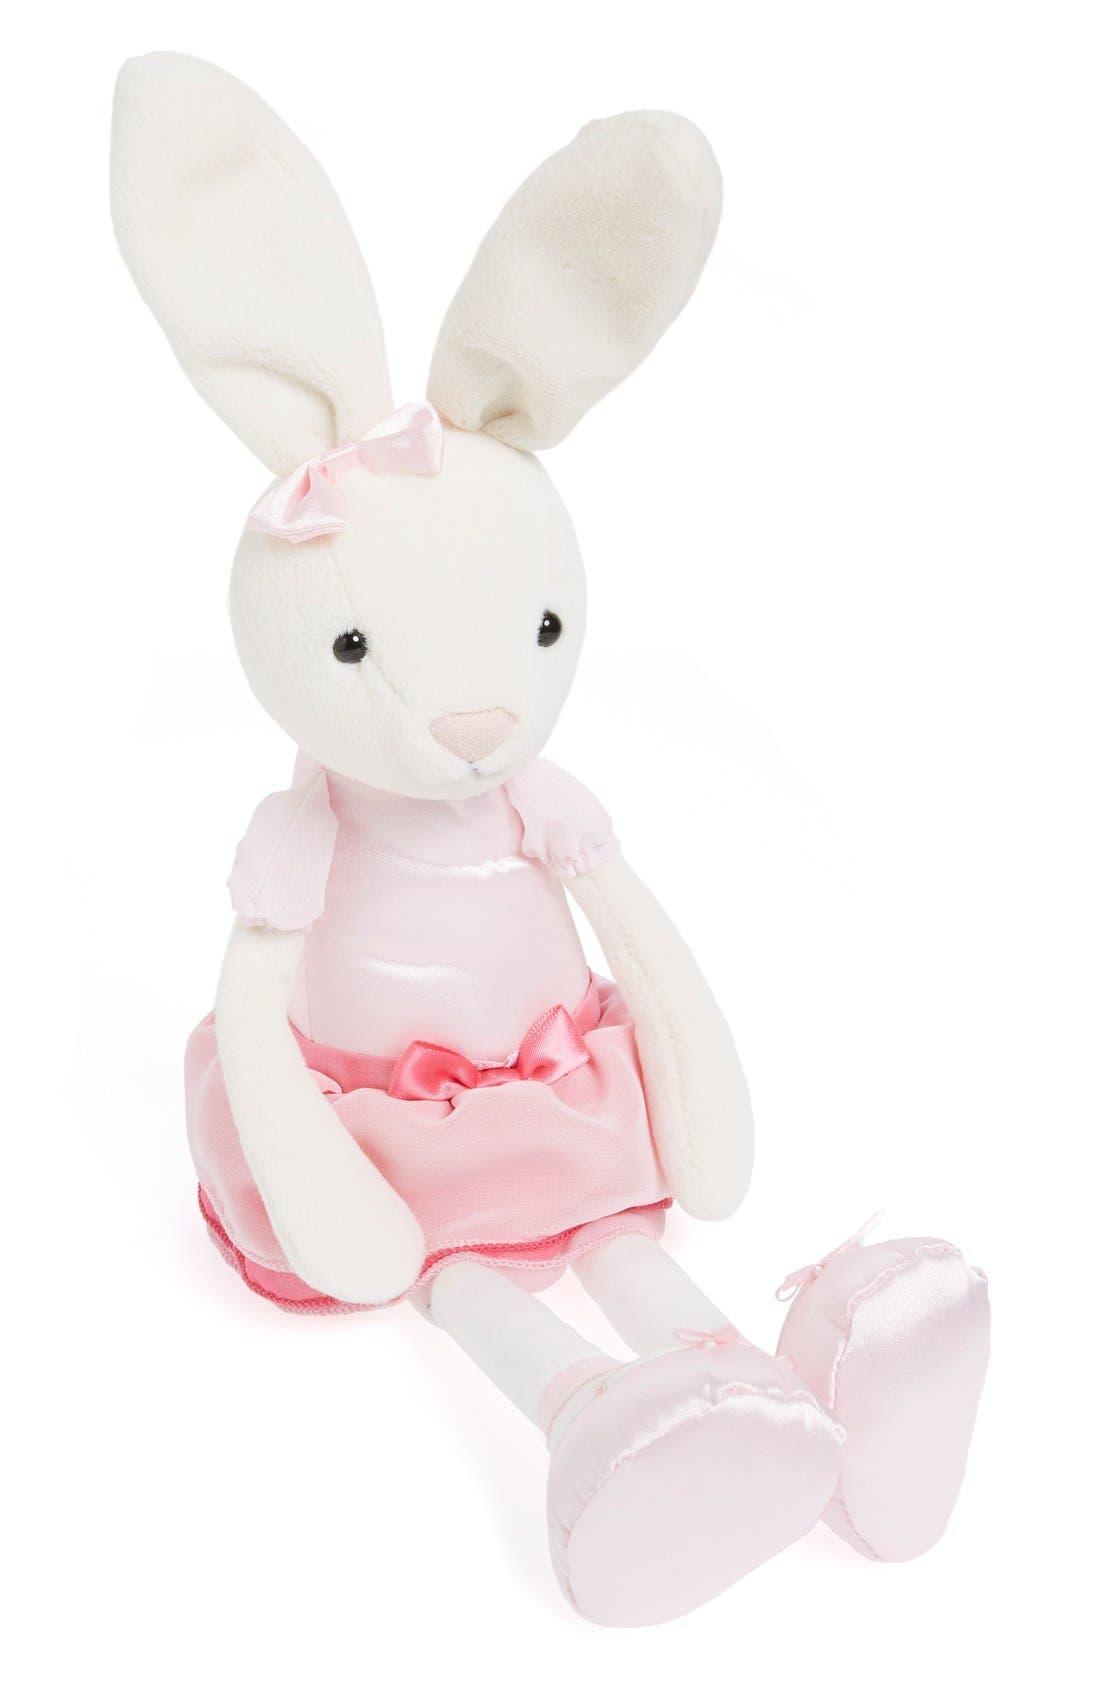 'Bitsy Ballerina Bunny' Stuffed Animal,                             Main thumbnail 1, color,                             660